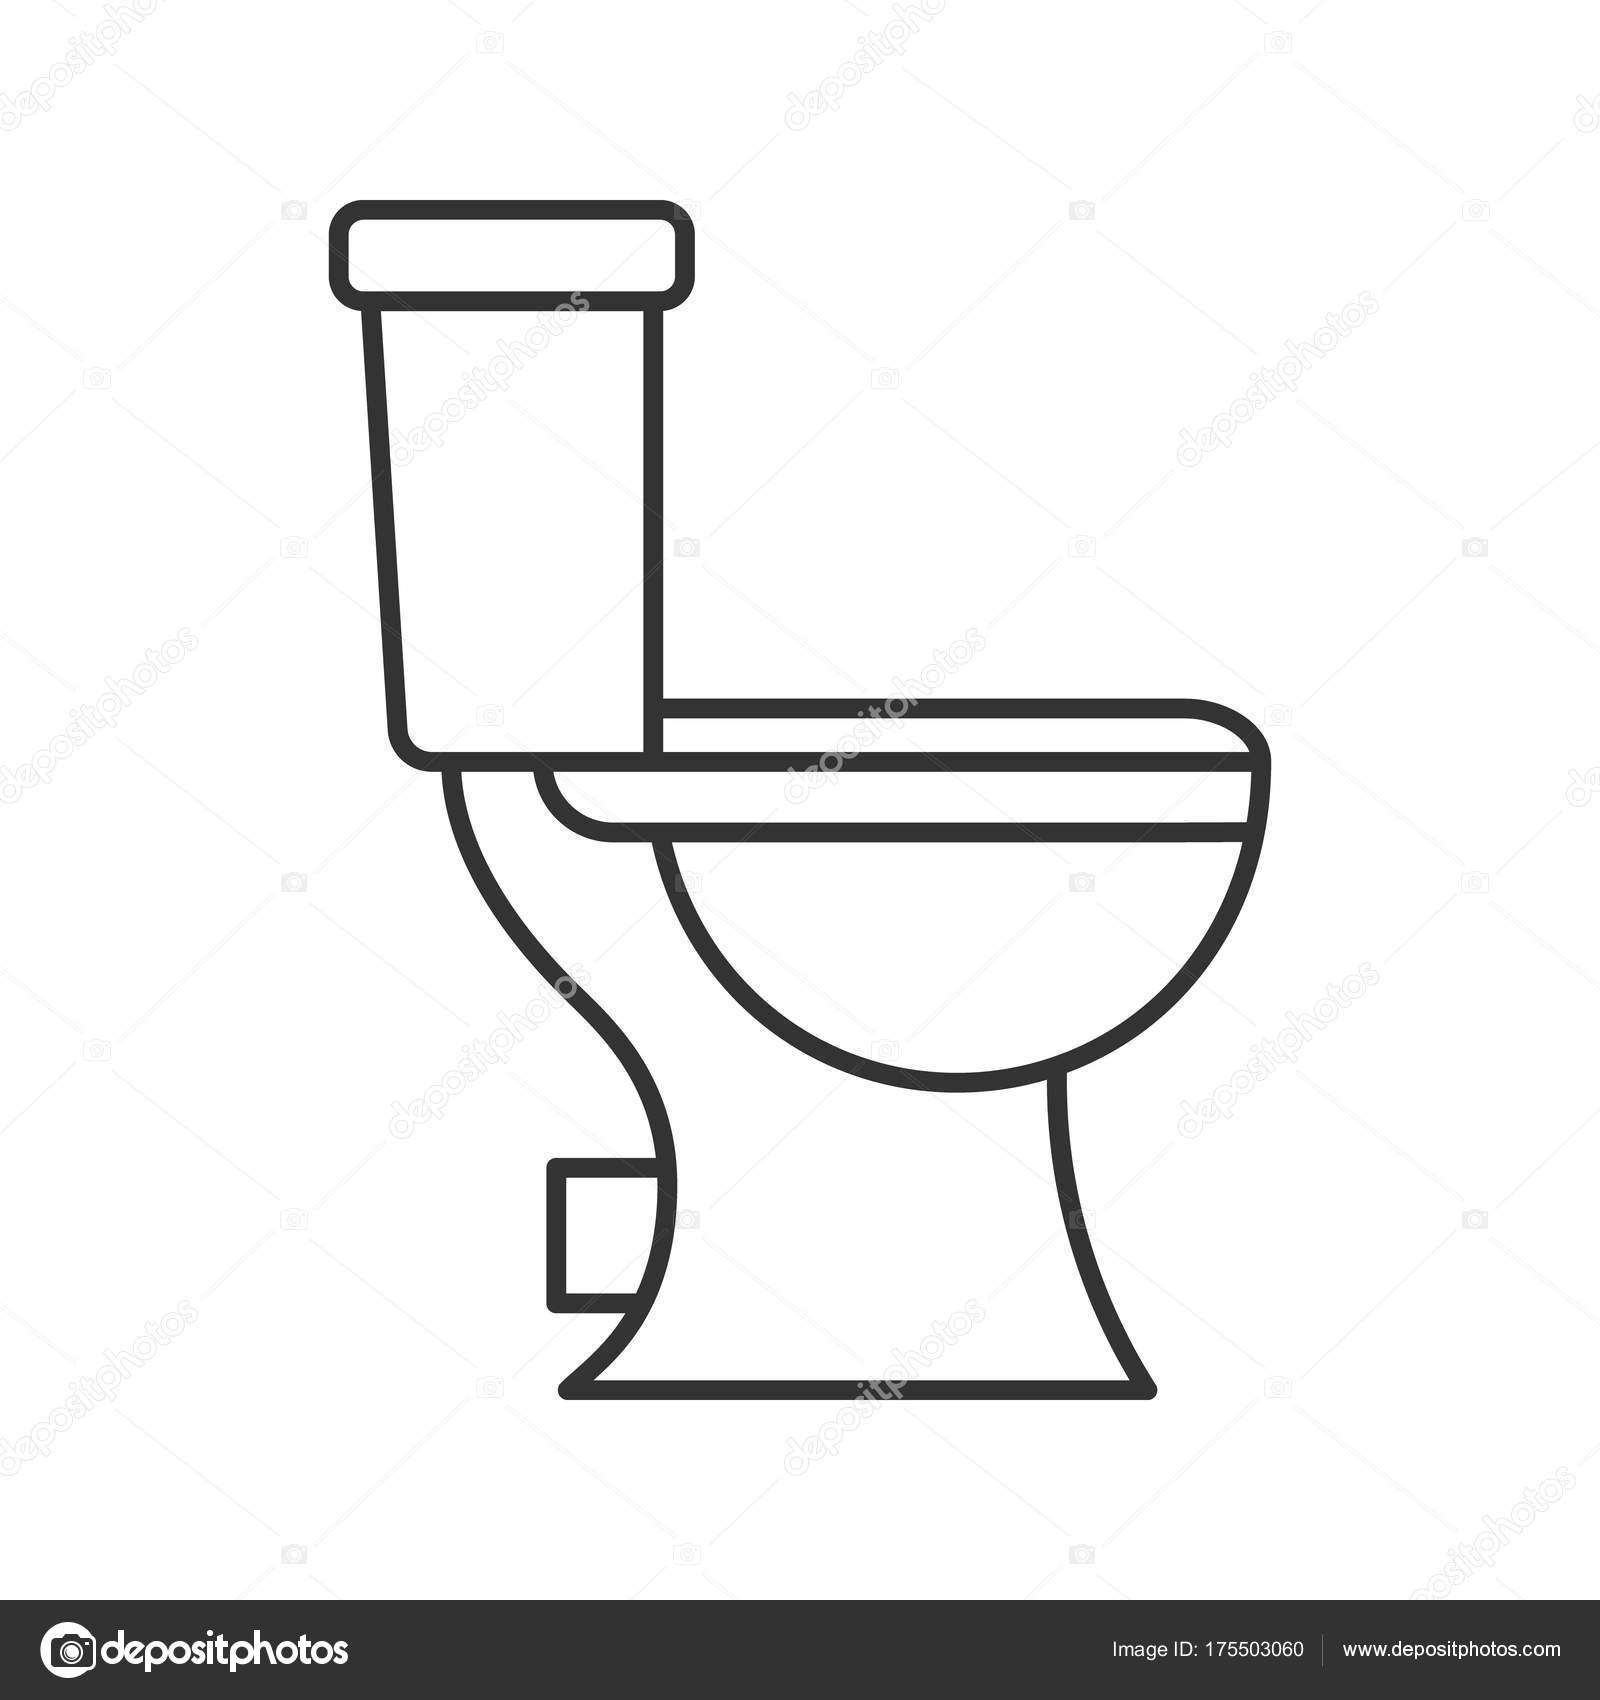 lavatory pan linear icon thin line illustration toilet